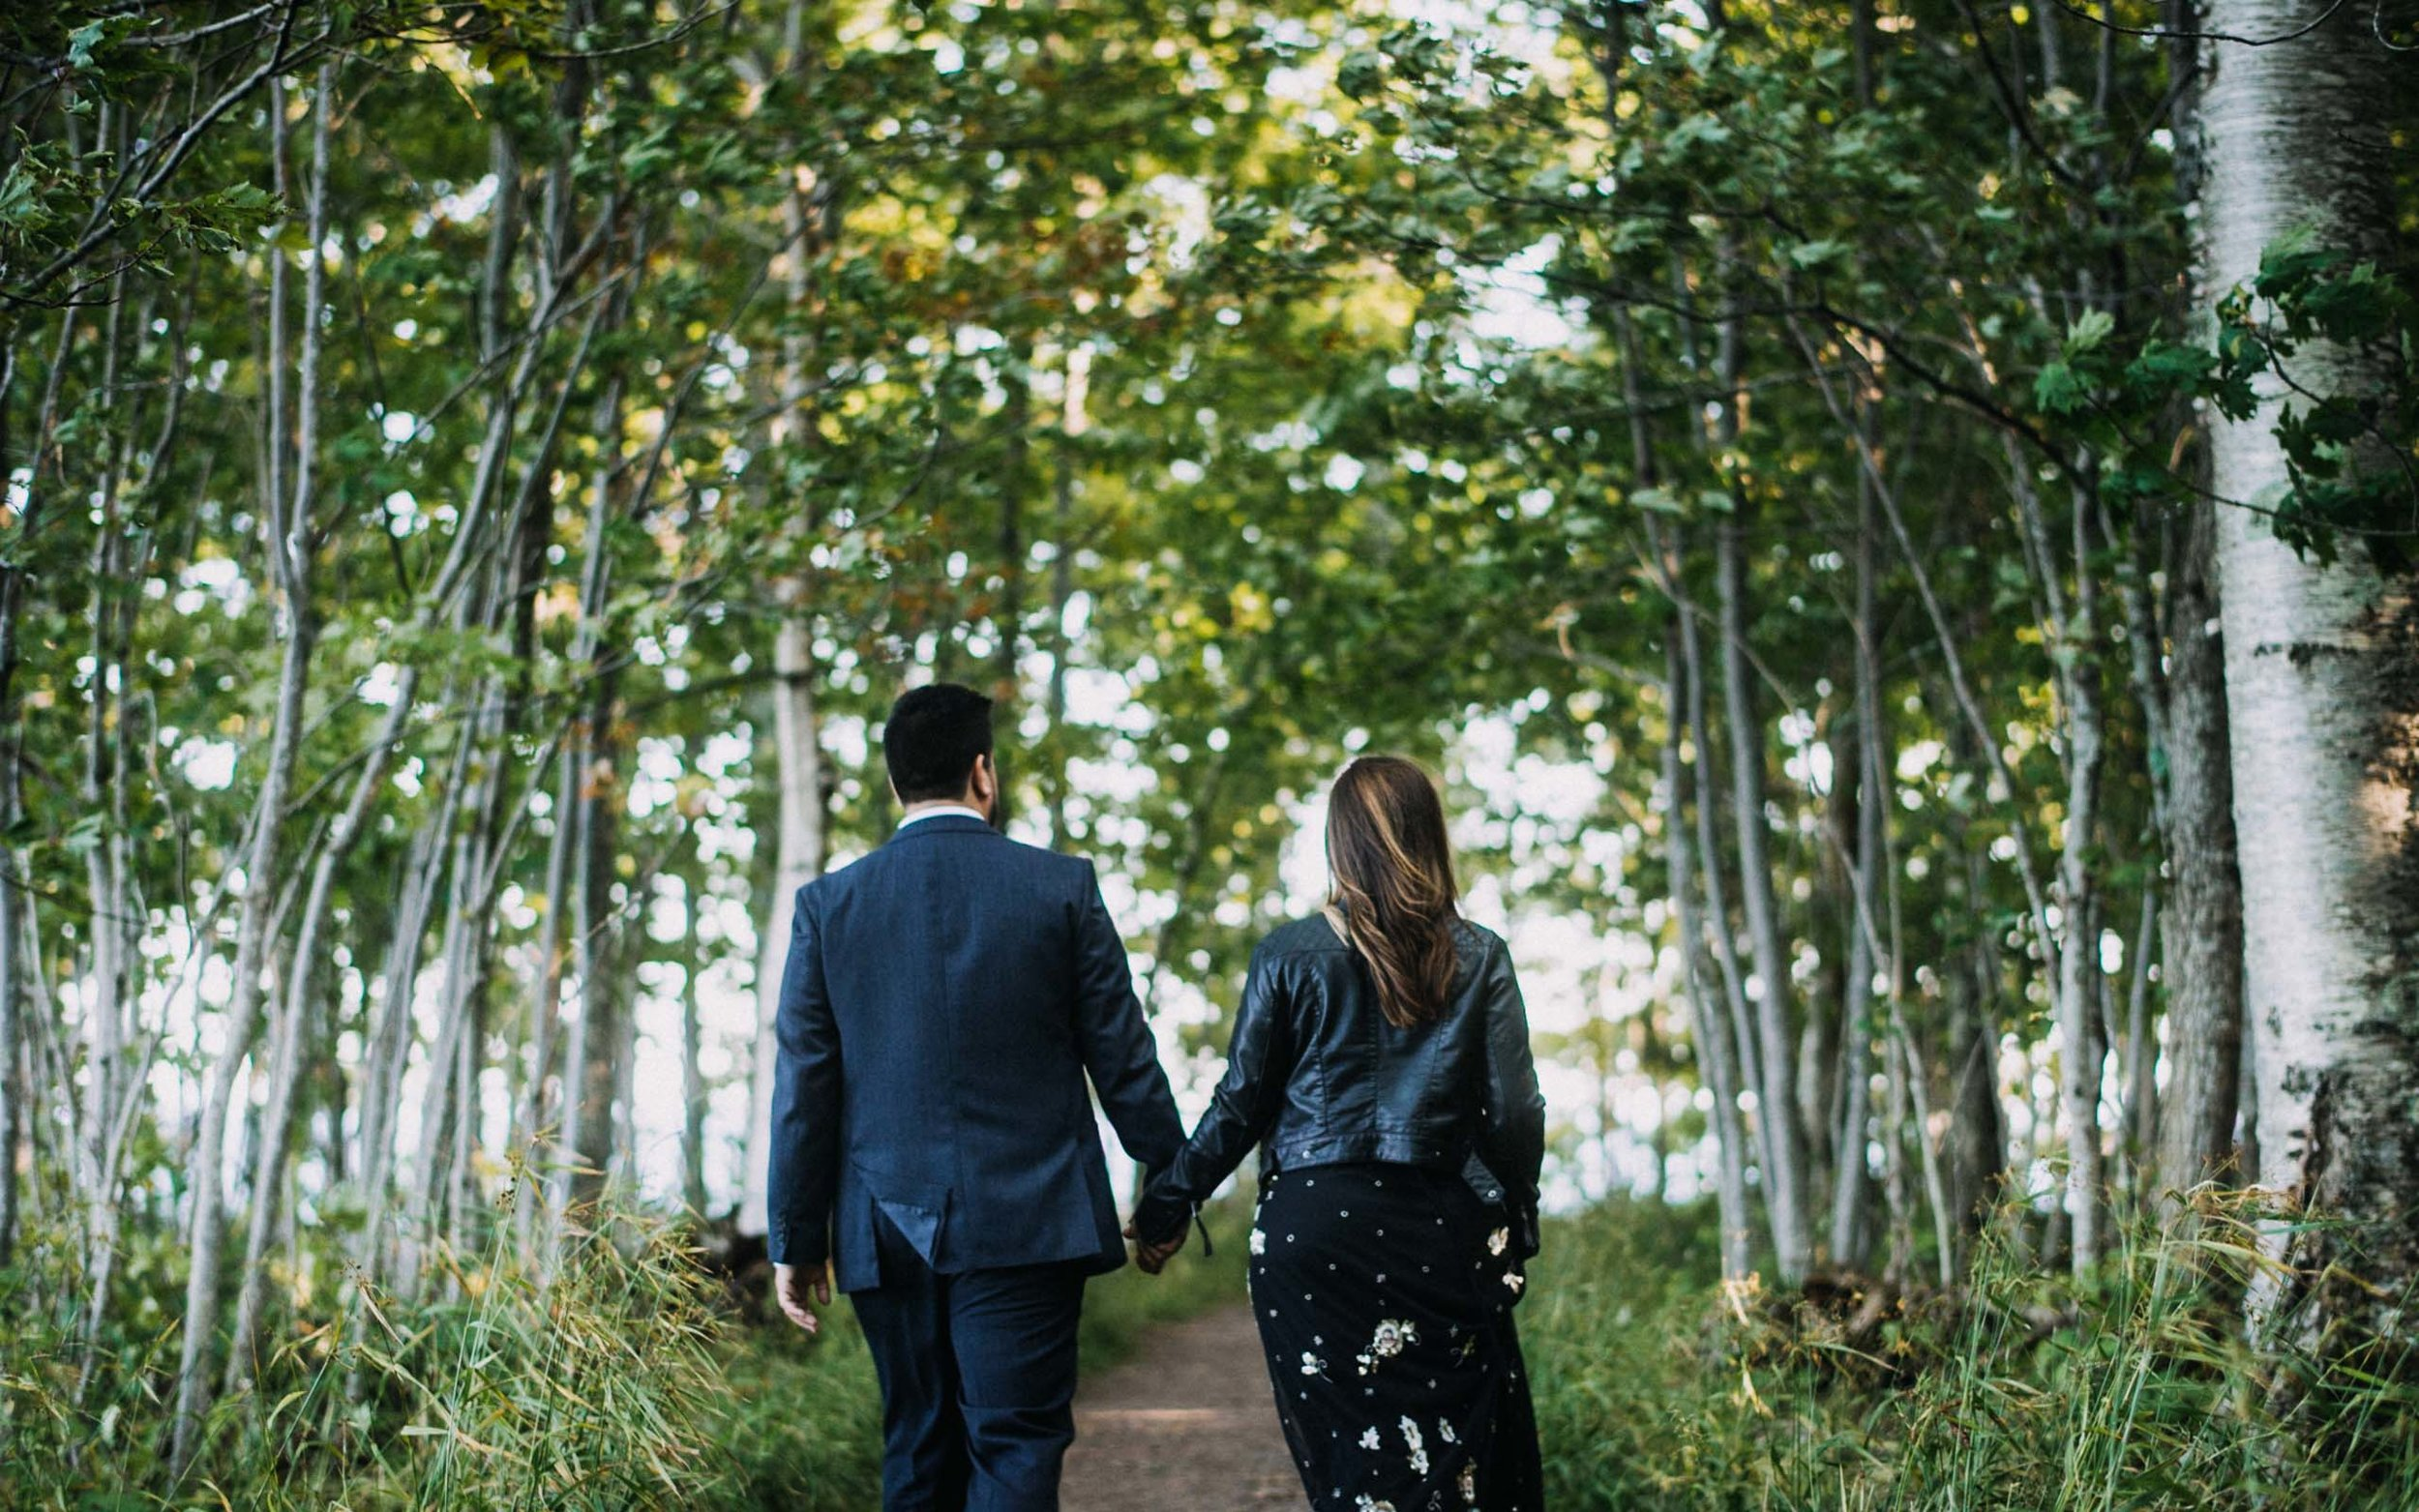 bayfield_madeline_island_wisconsin_wedding_engagement_session-5341.JPG